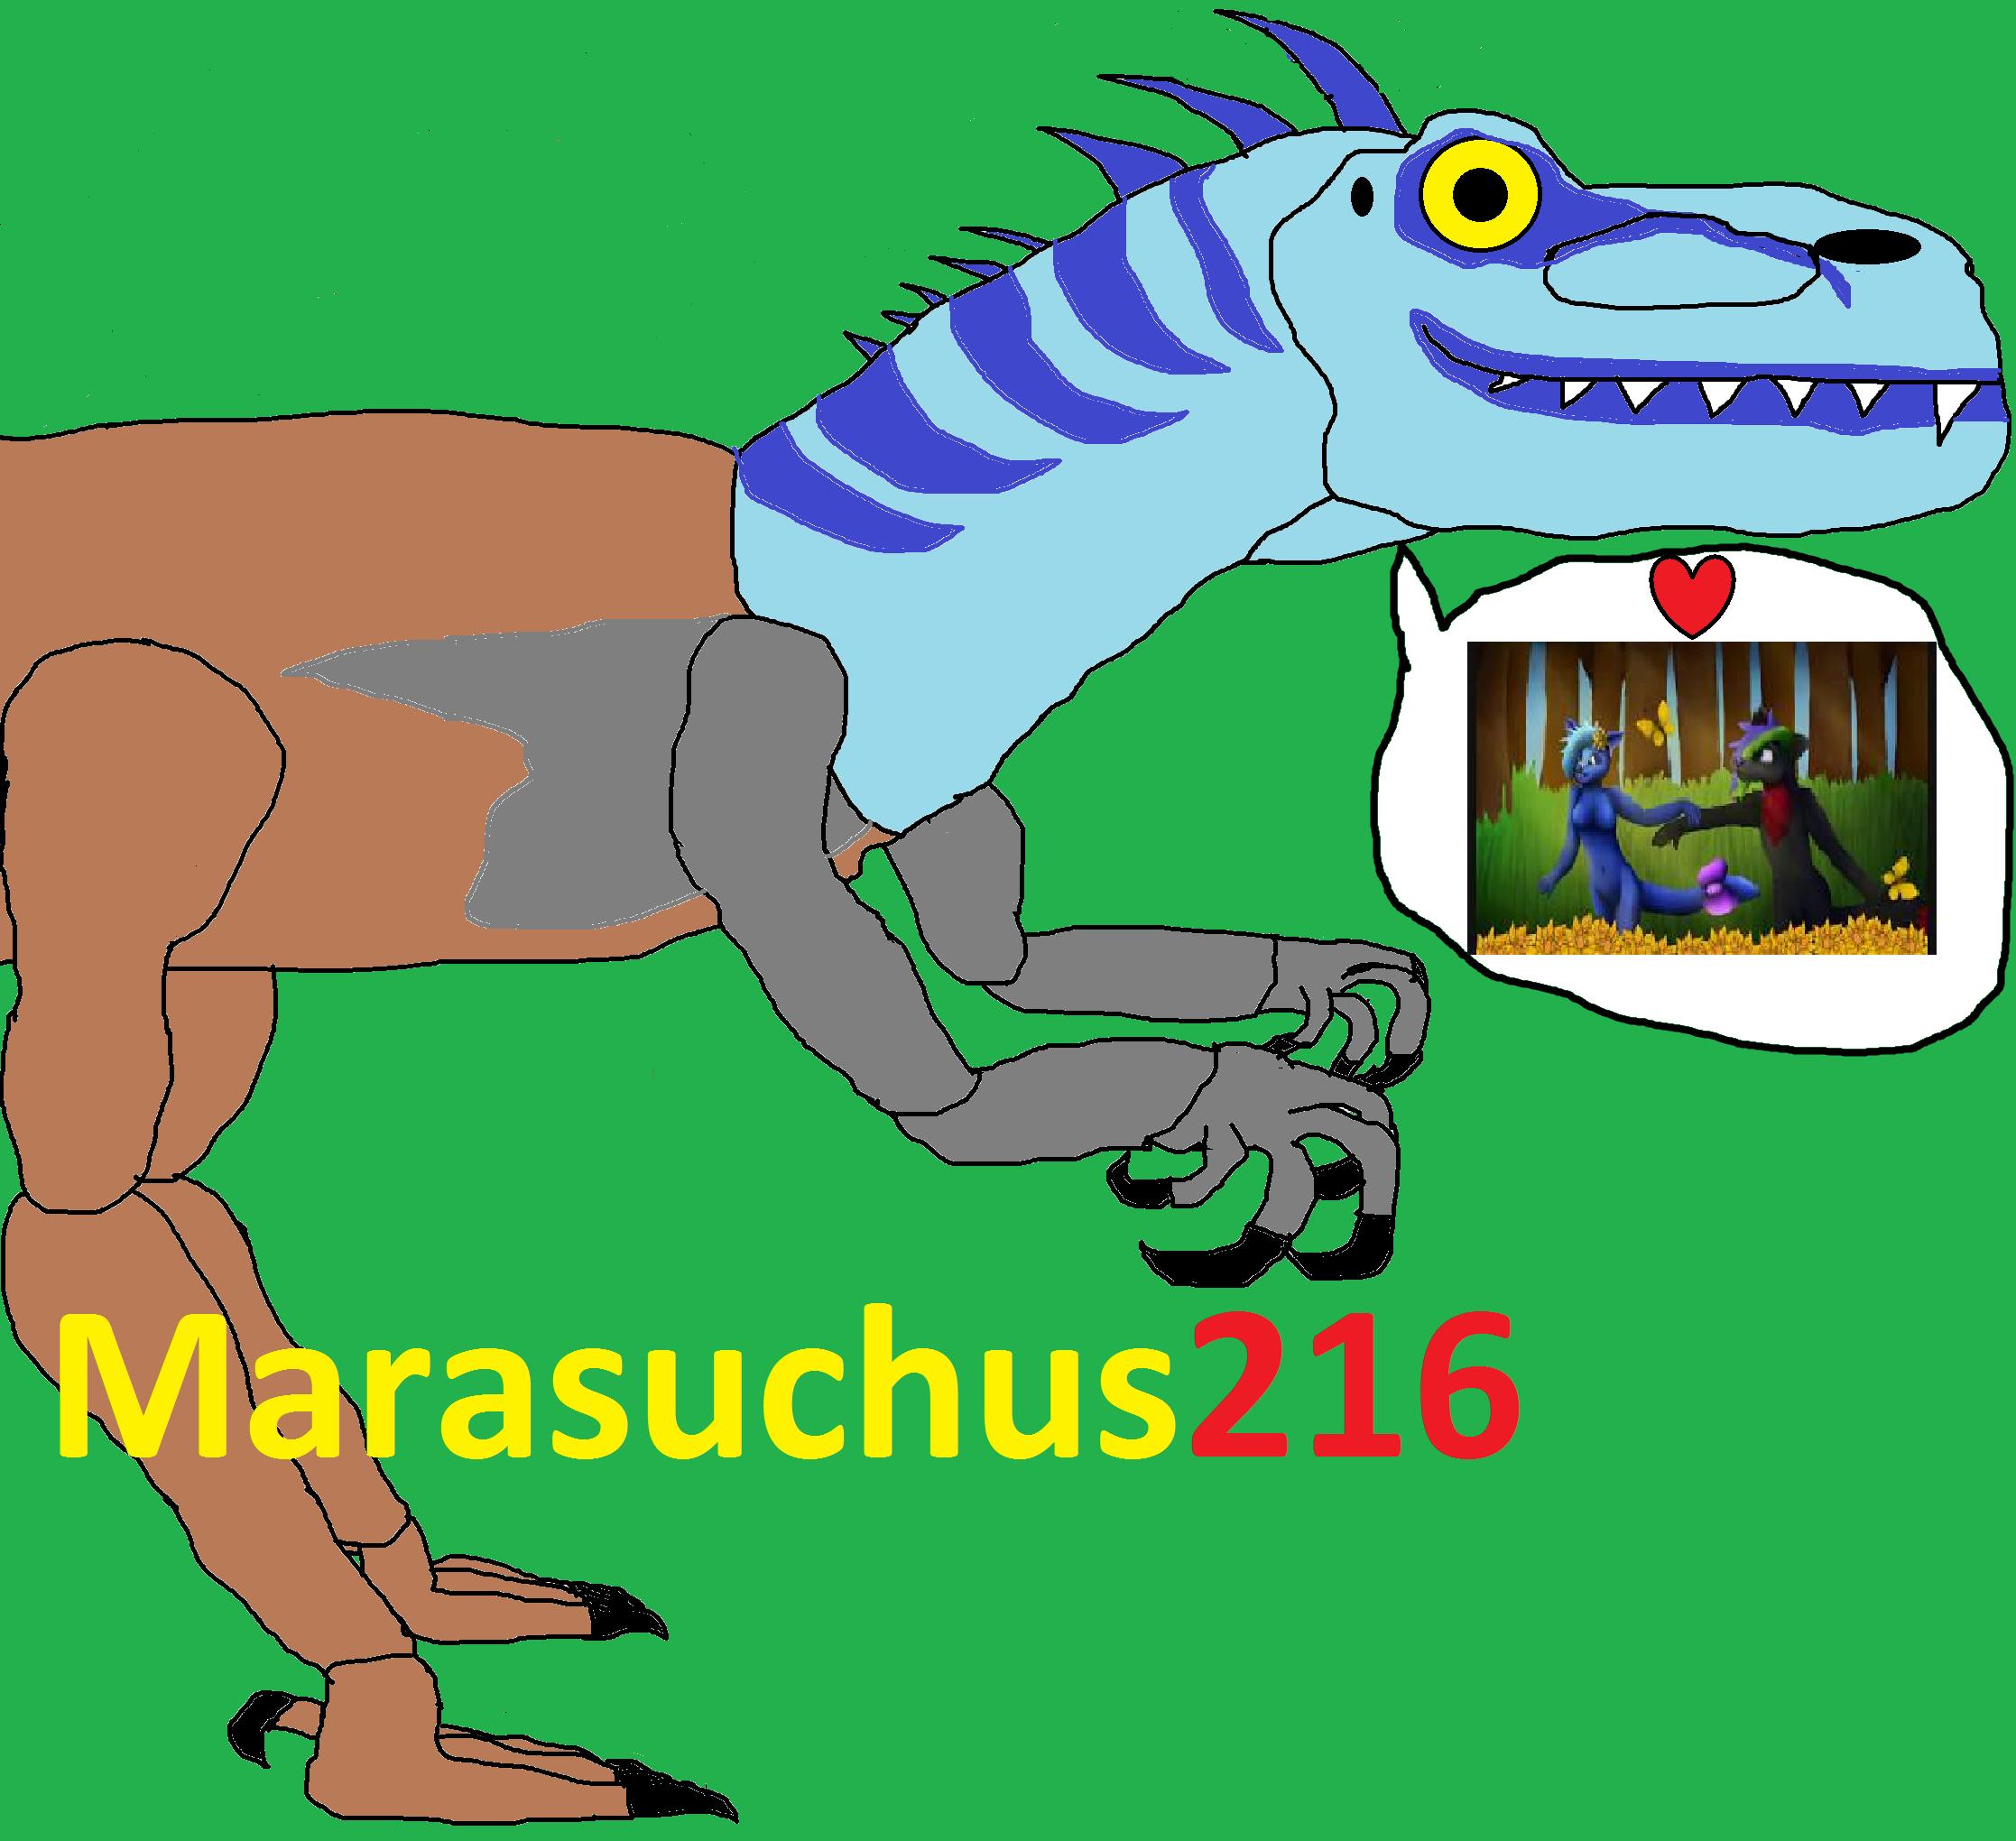 Marasuchus216